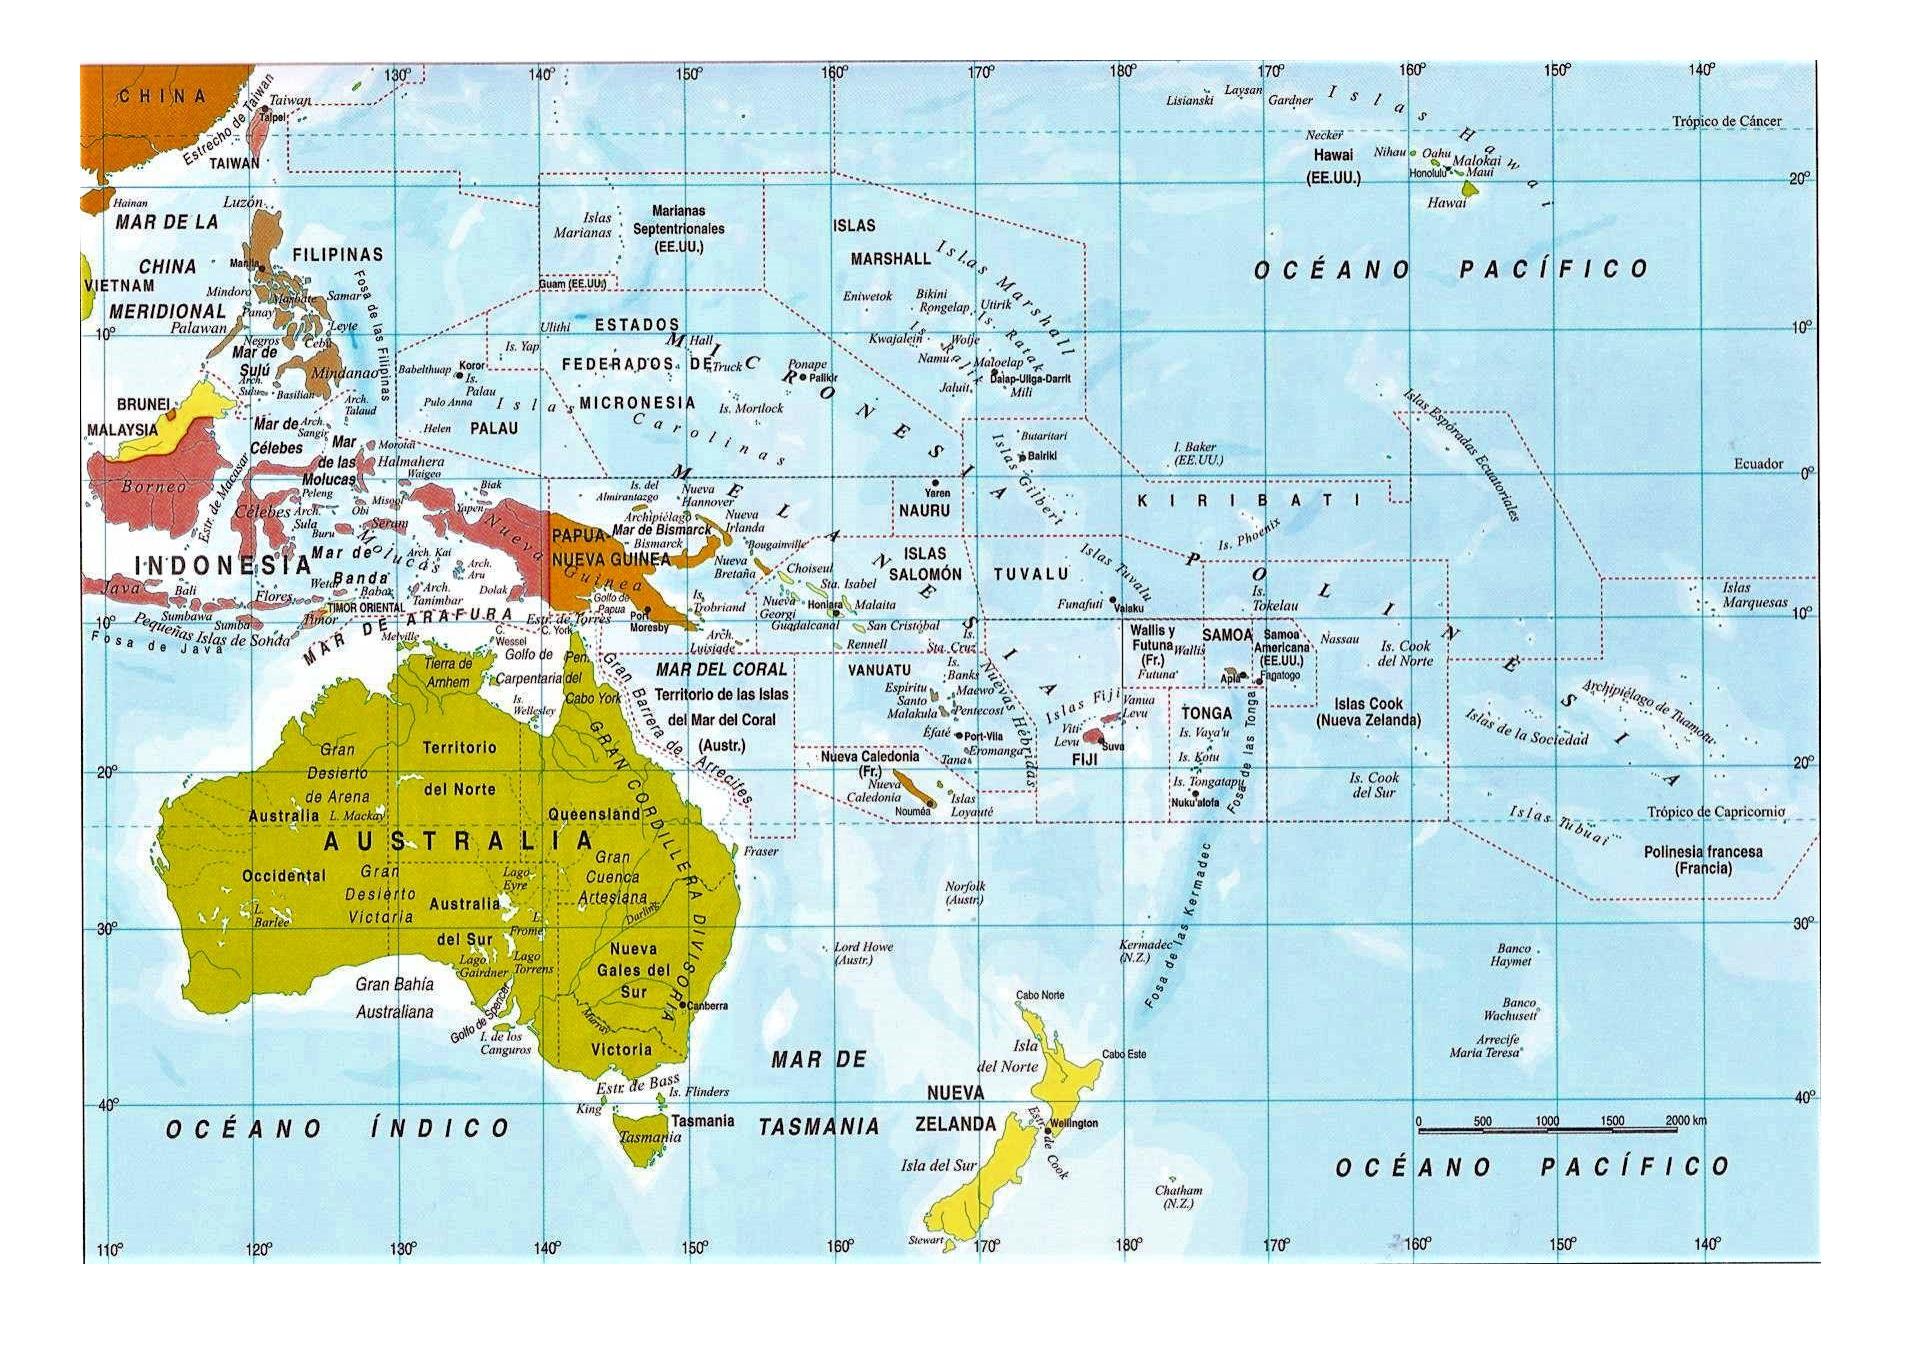 Mapa Oceania Mudo Fisico.Mapa De Oceania Politico Fisico Mudo Con Nombres Mapamundi